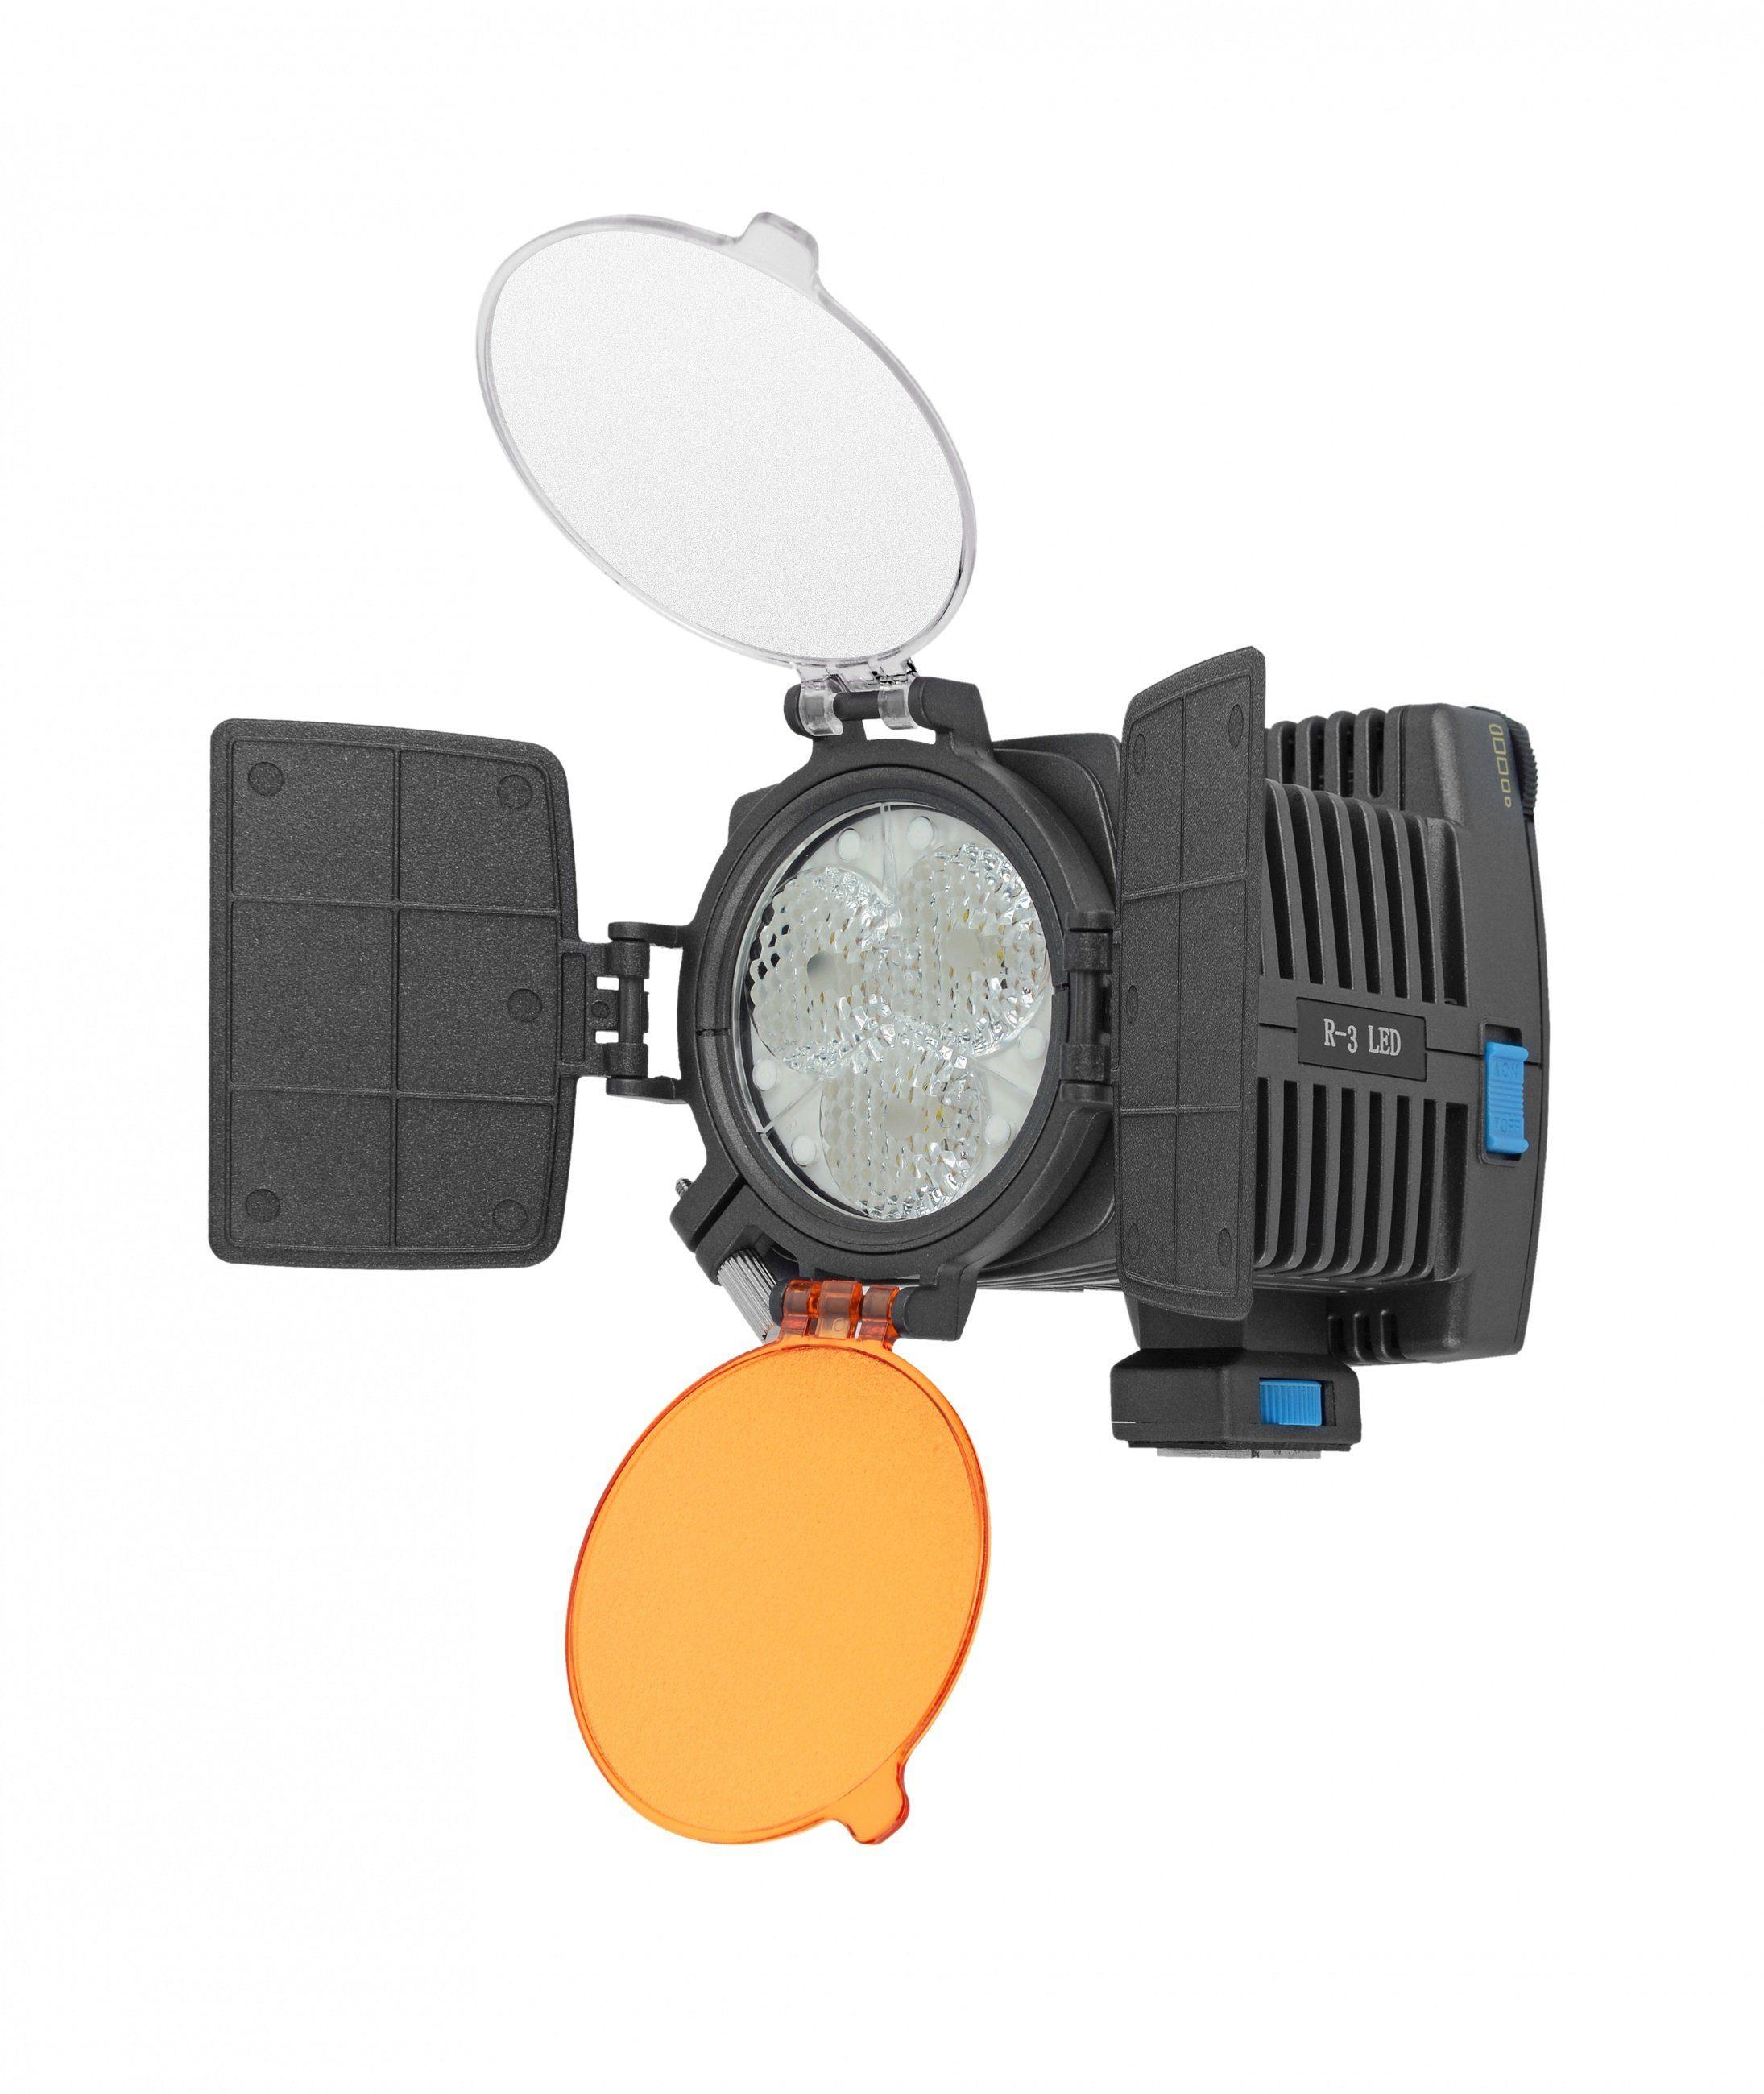 Bresser Fotostudio »S-3 Video-Beleuchtung LED 3x4W«